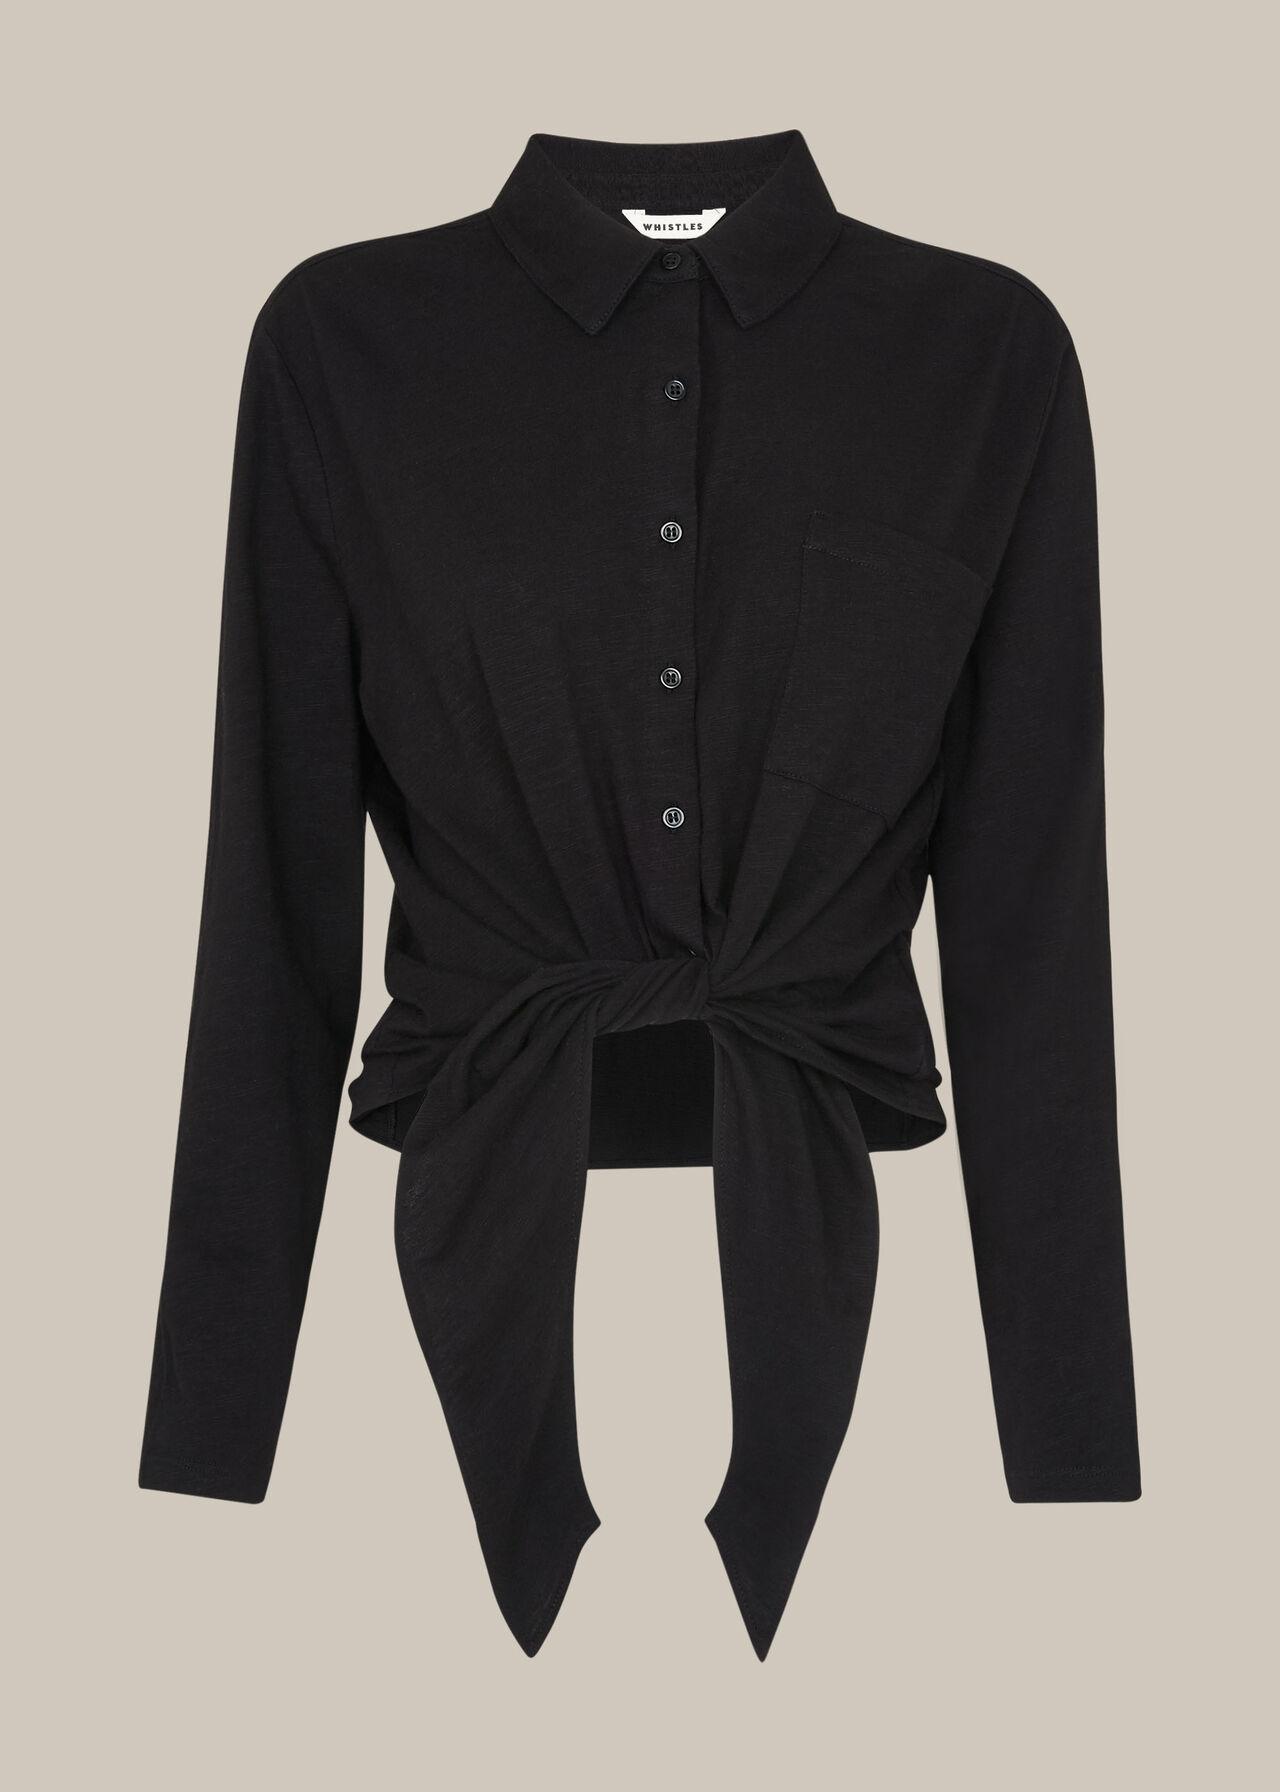 Tie Front Button Down Shirt